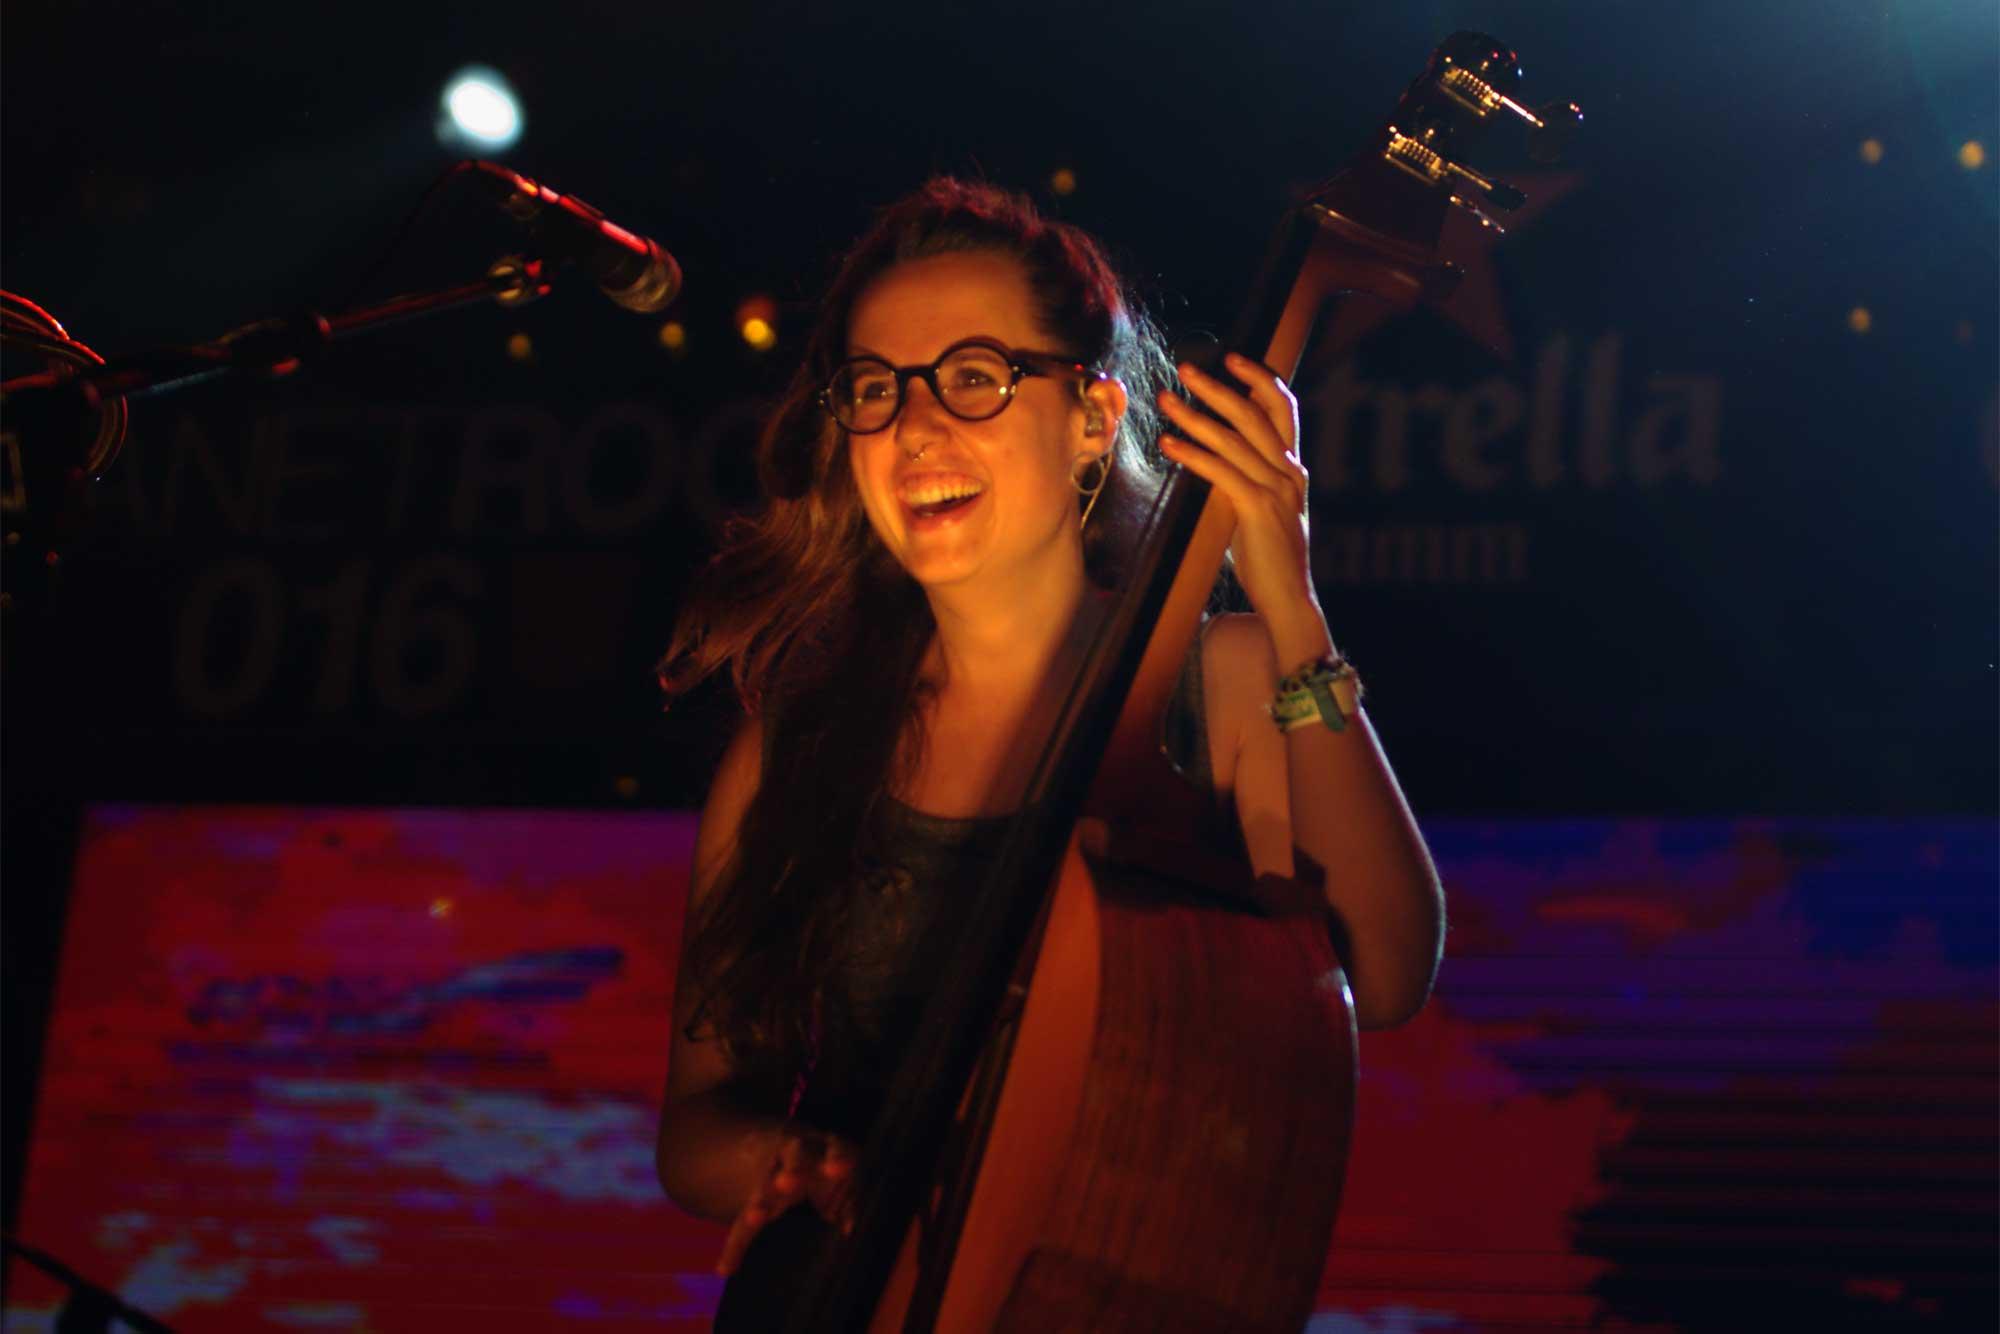 2019 Cerdanyola del Vallès Street Festival: O